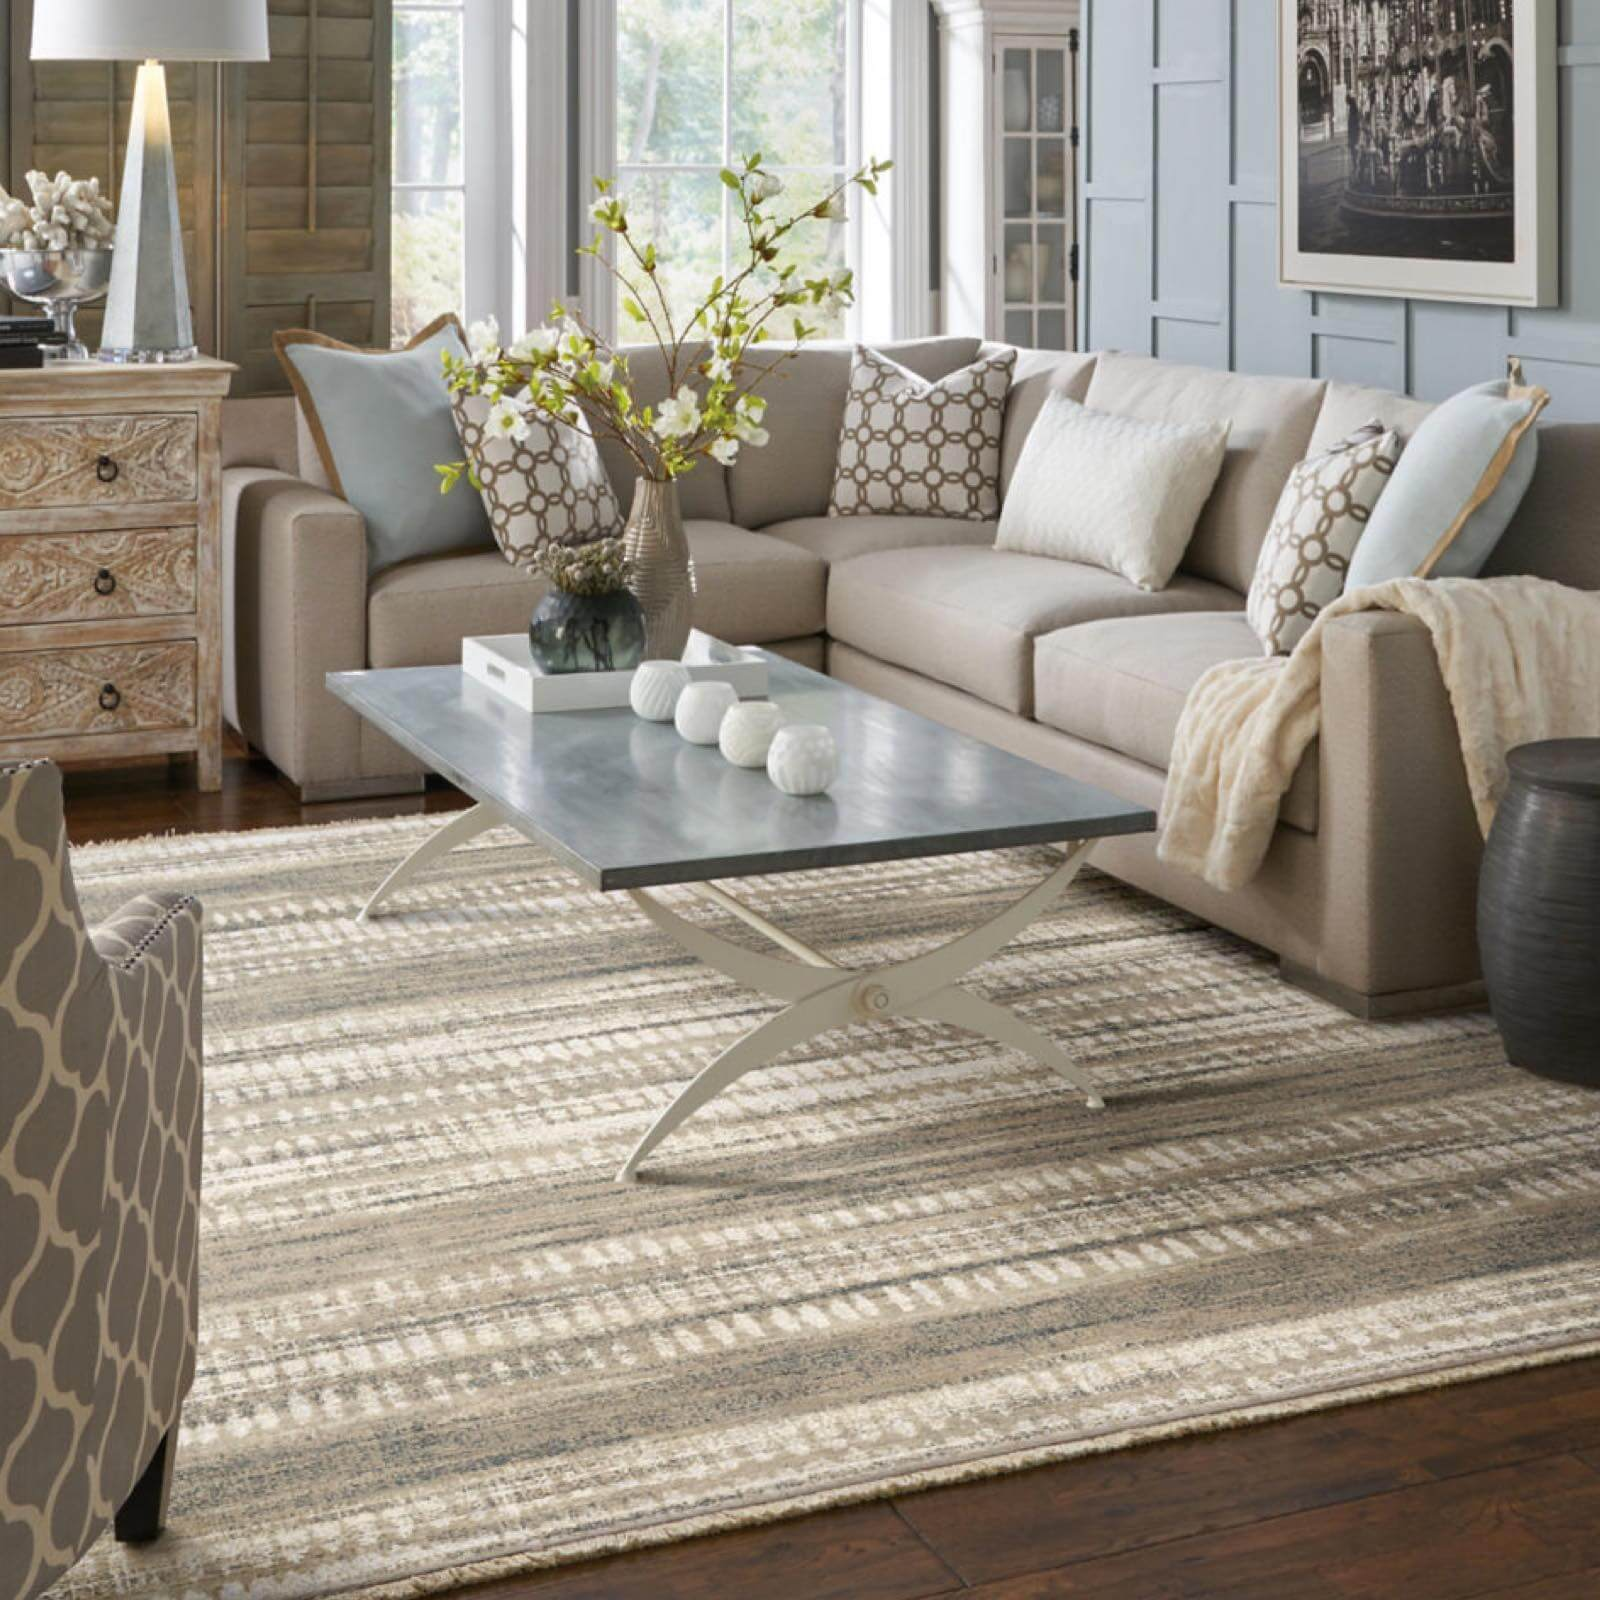 Area Rug in LIving Room | Haley's Flooring & Interiors